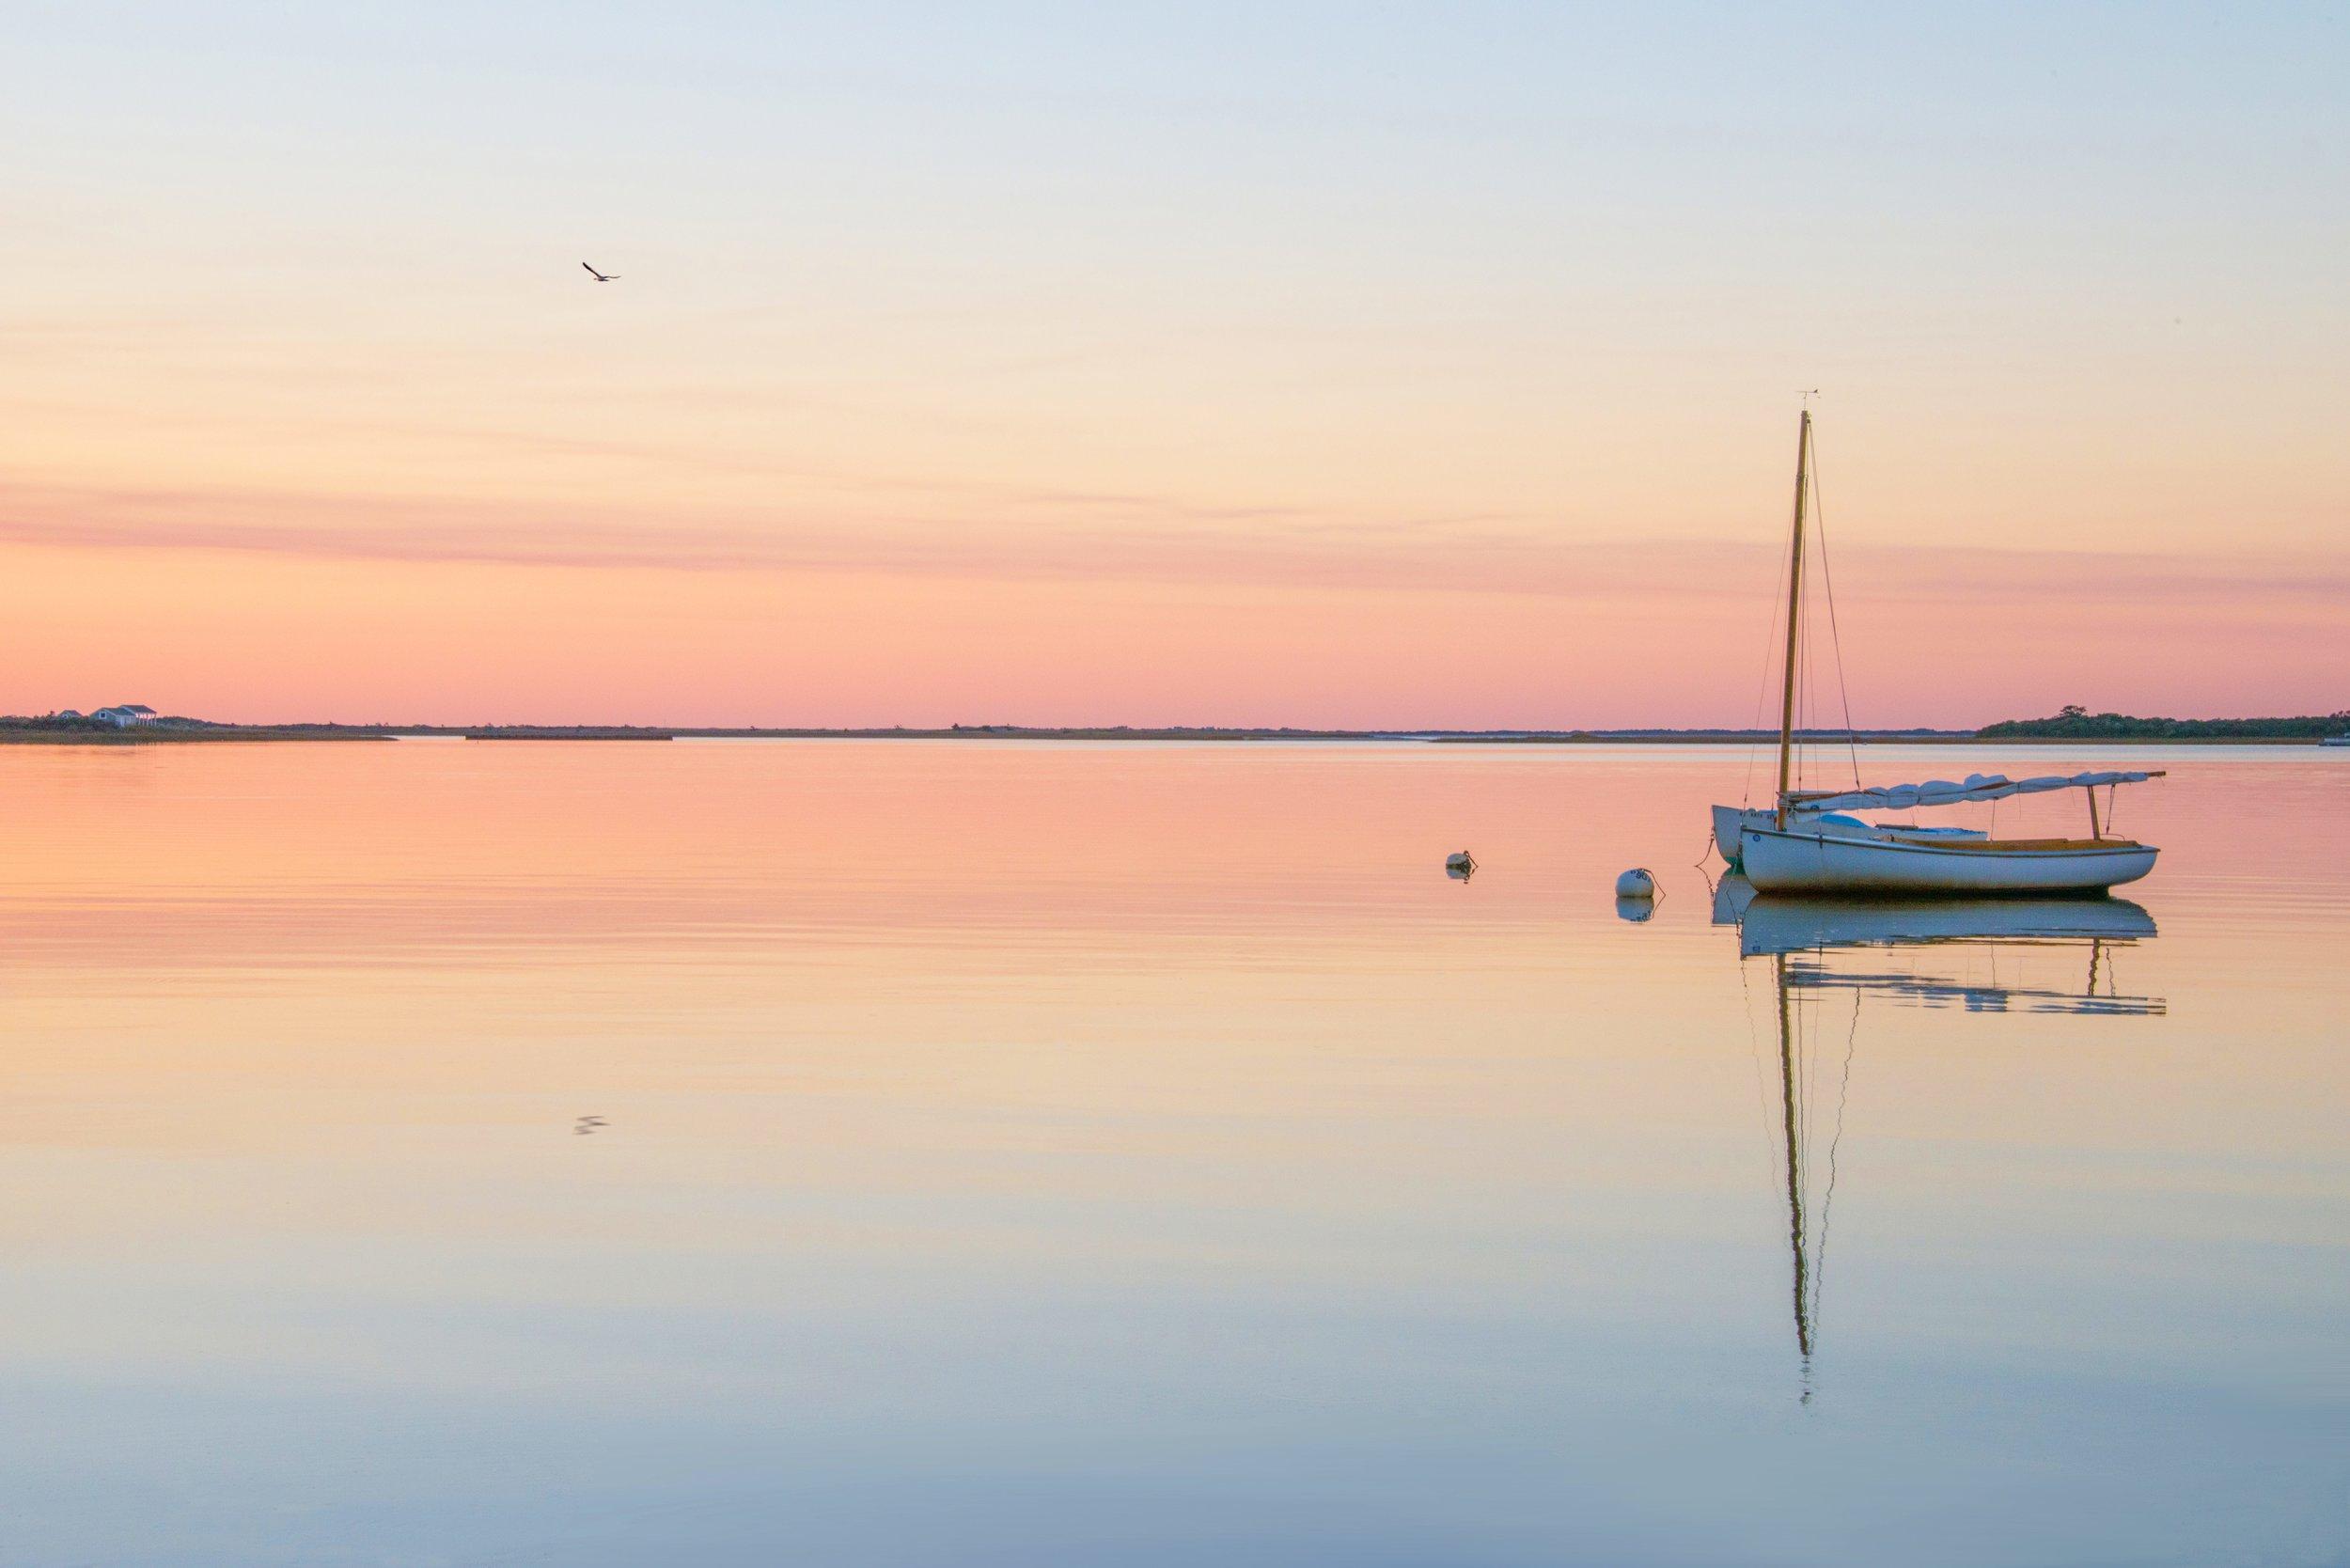 Polpis Harbor, Nantucket, MA